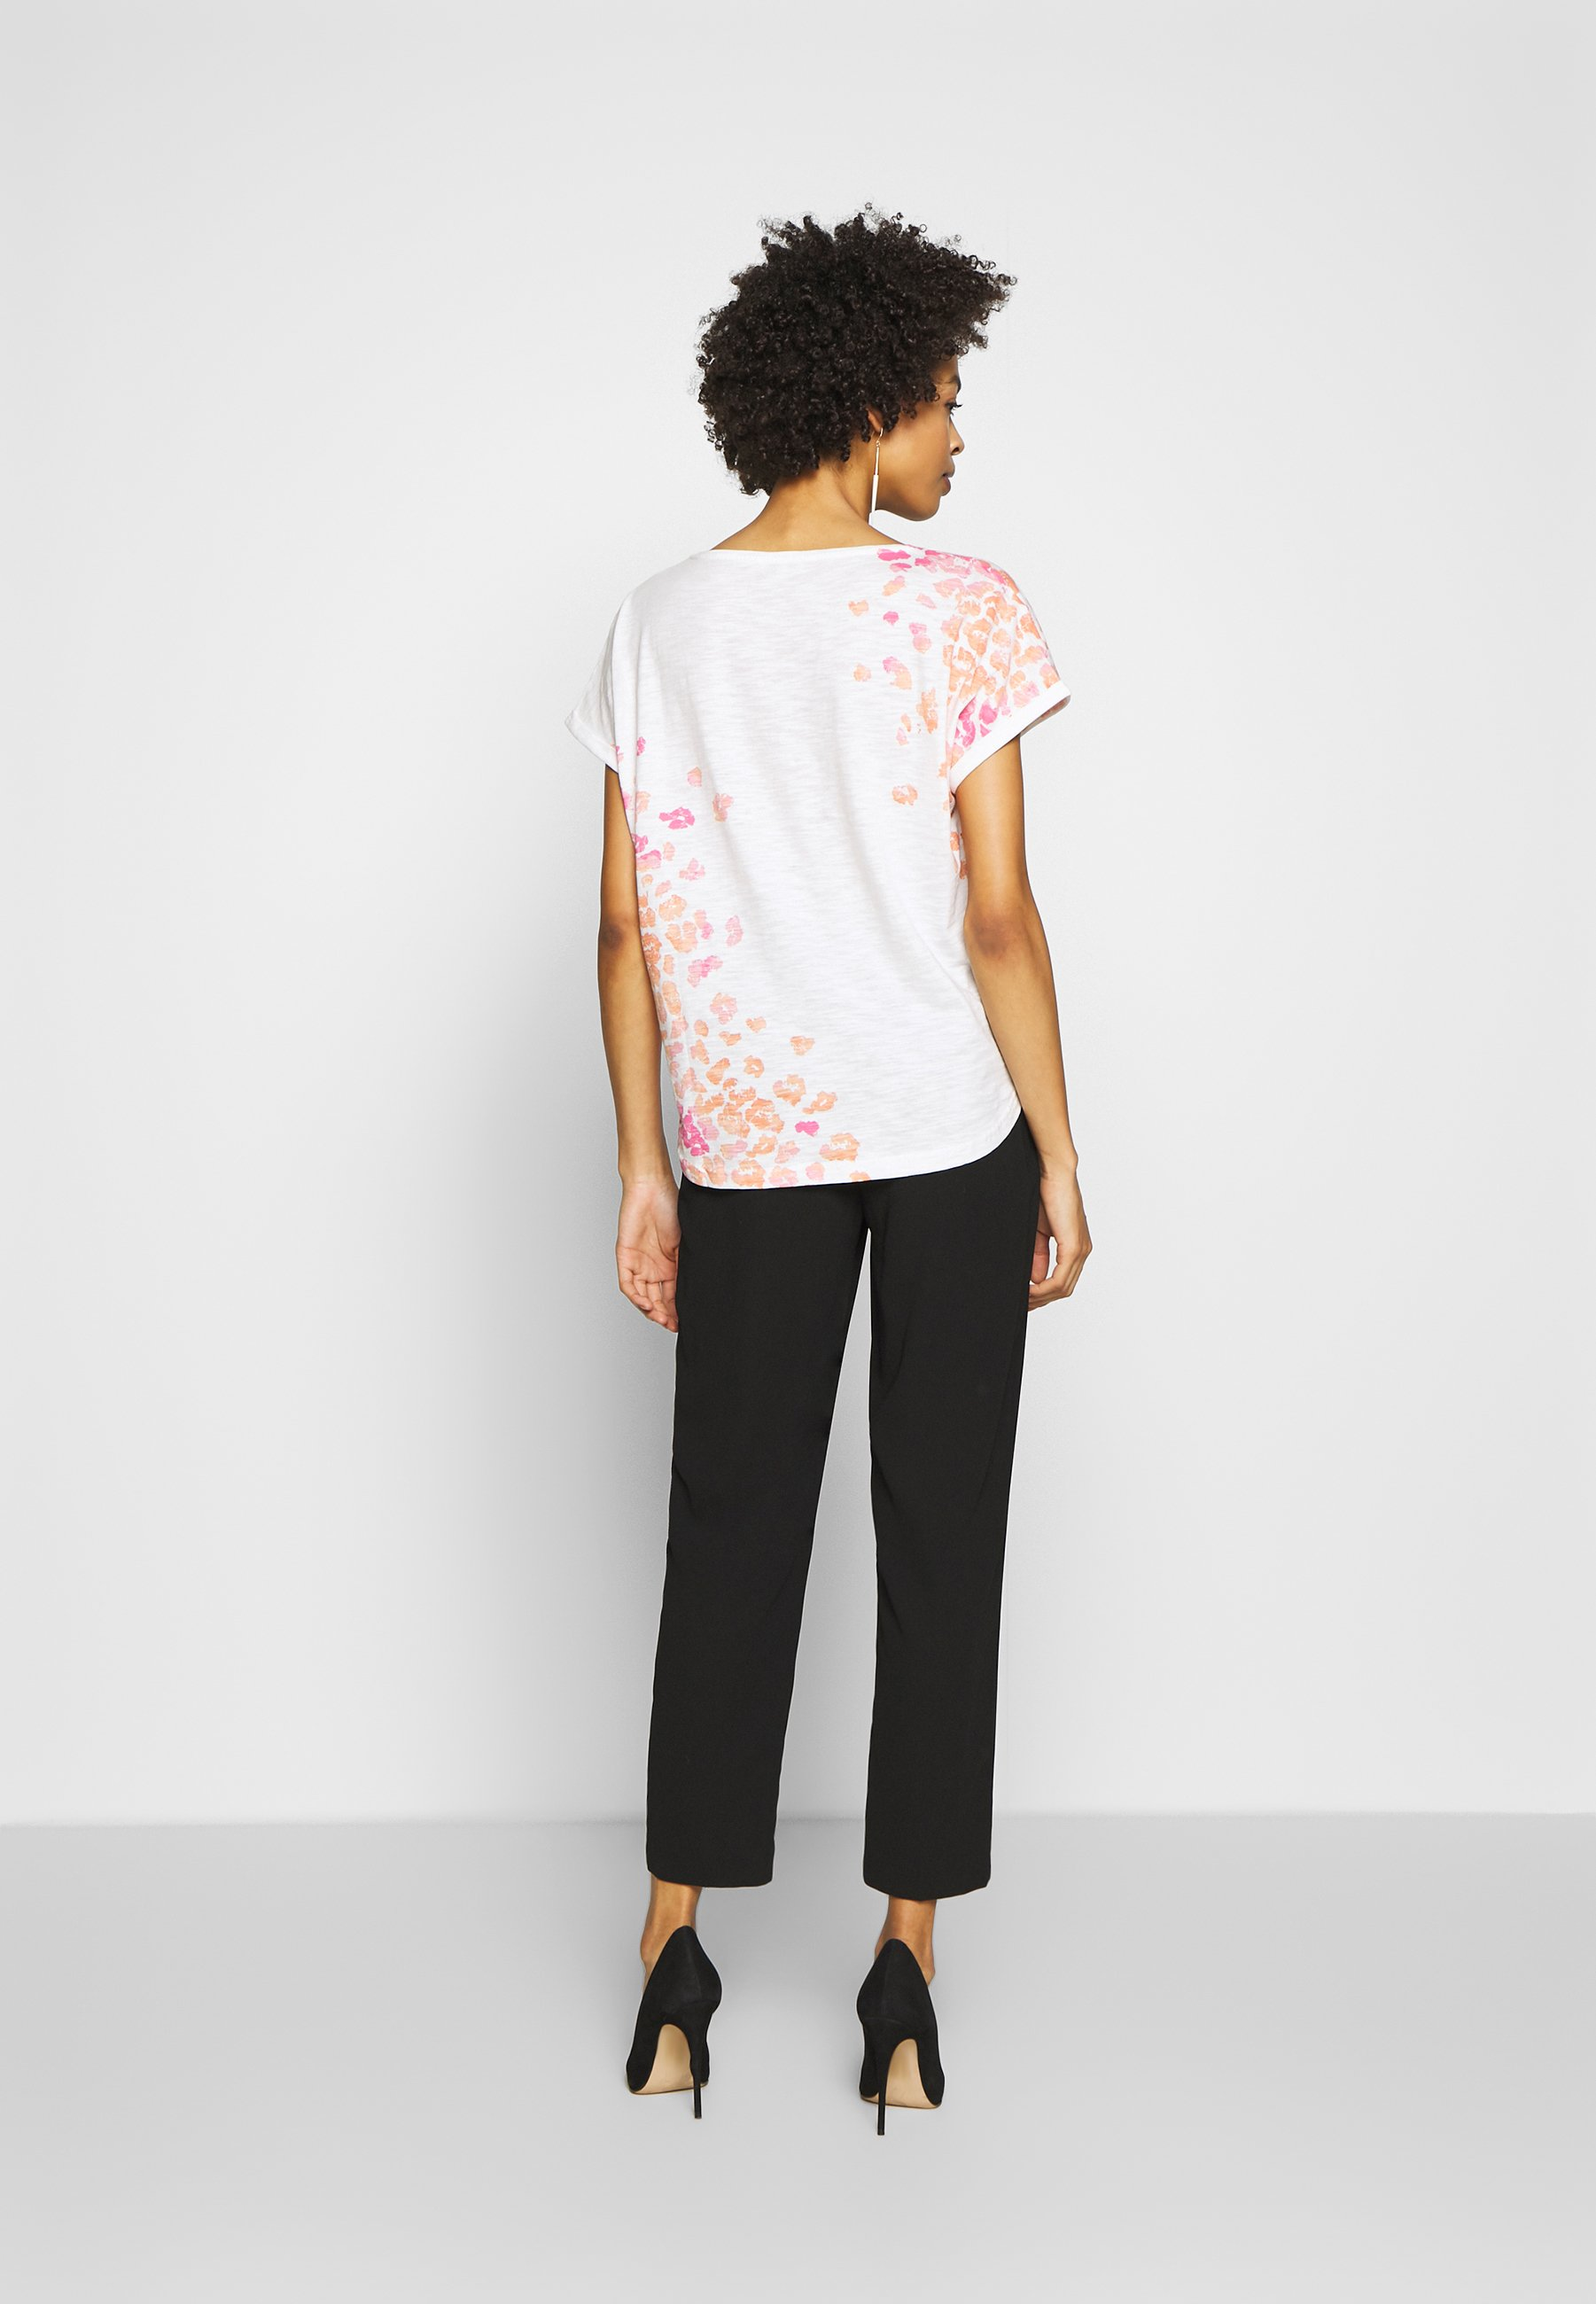 TOM TAILOR SLUB PLACED PRINT - T-shirts med print - whisper white